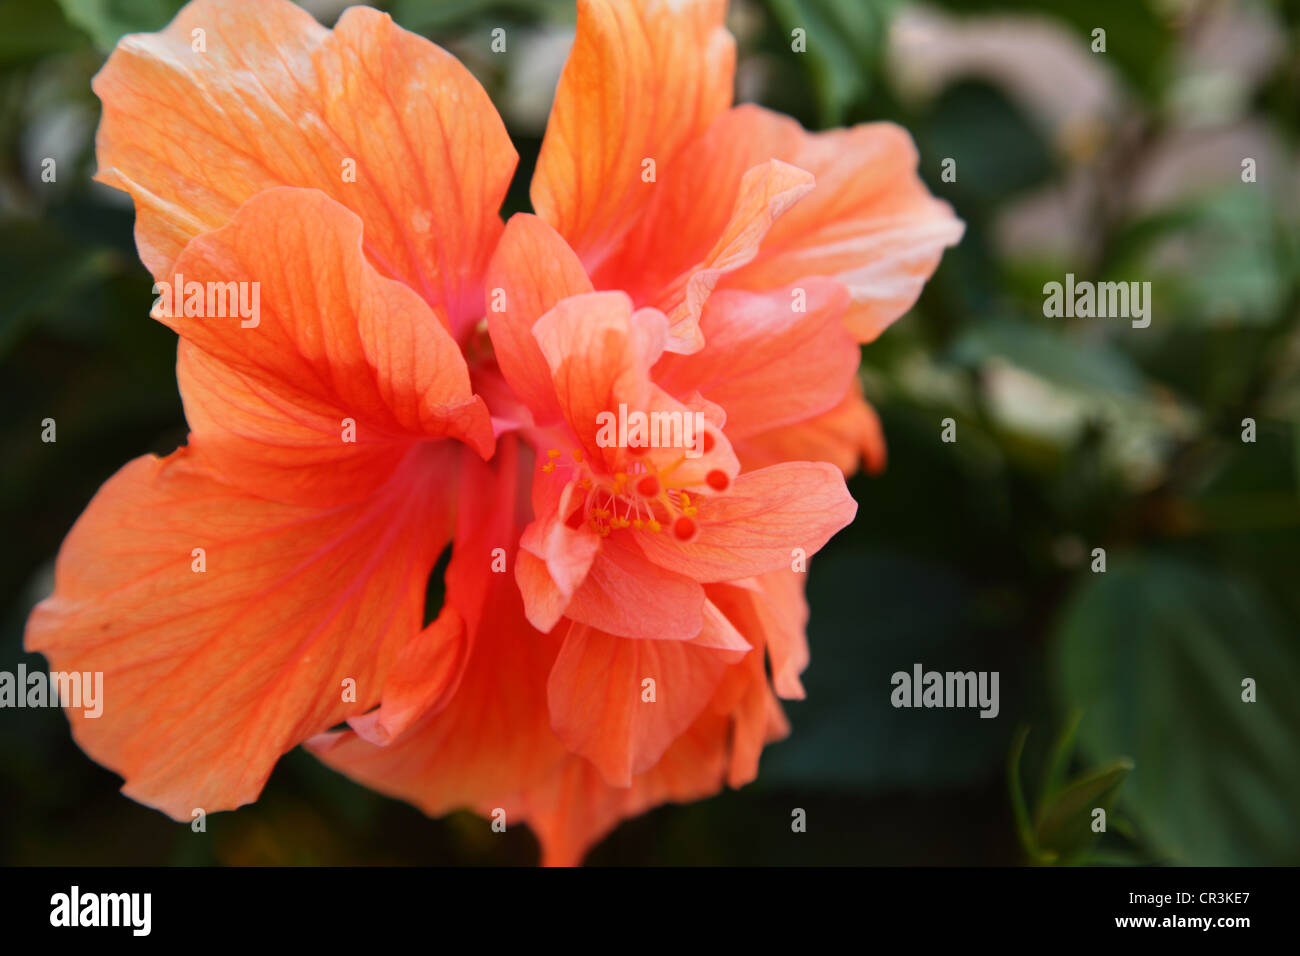 Sunset hibiscus stock photos sunset hibiscus stock images alamy tropical hibiscus flower stock image izmirmasajfo